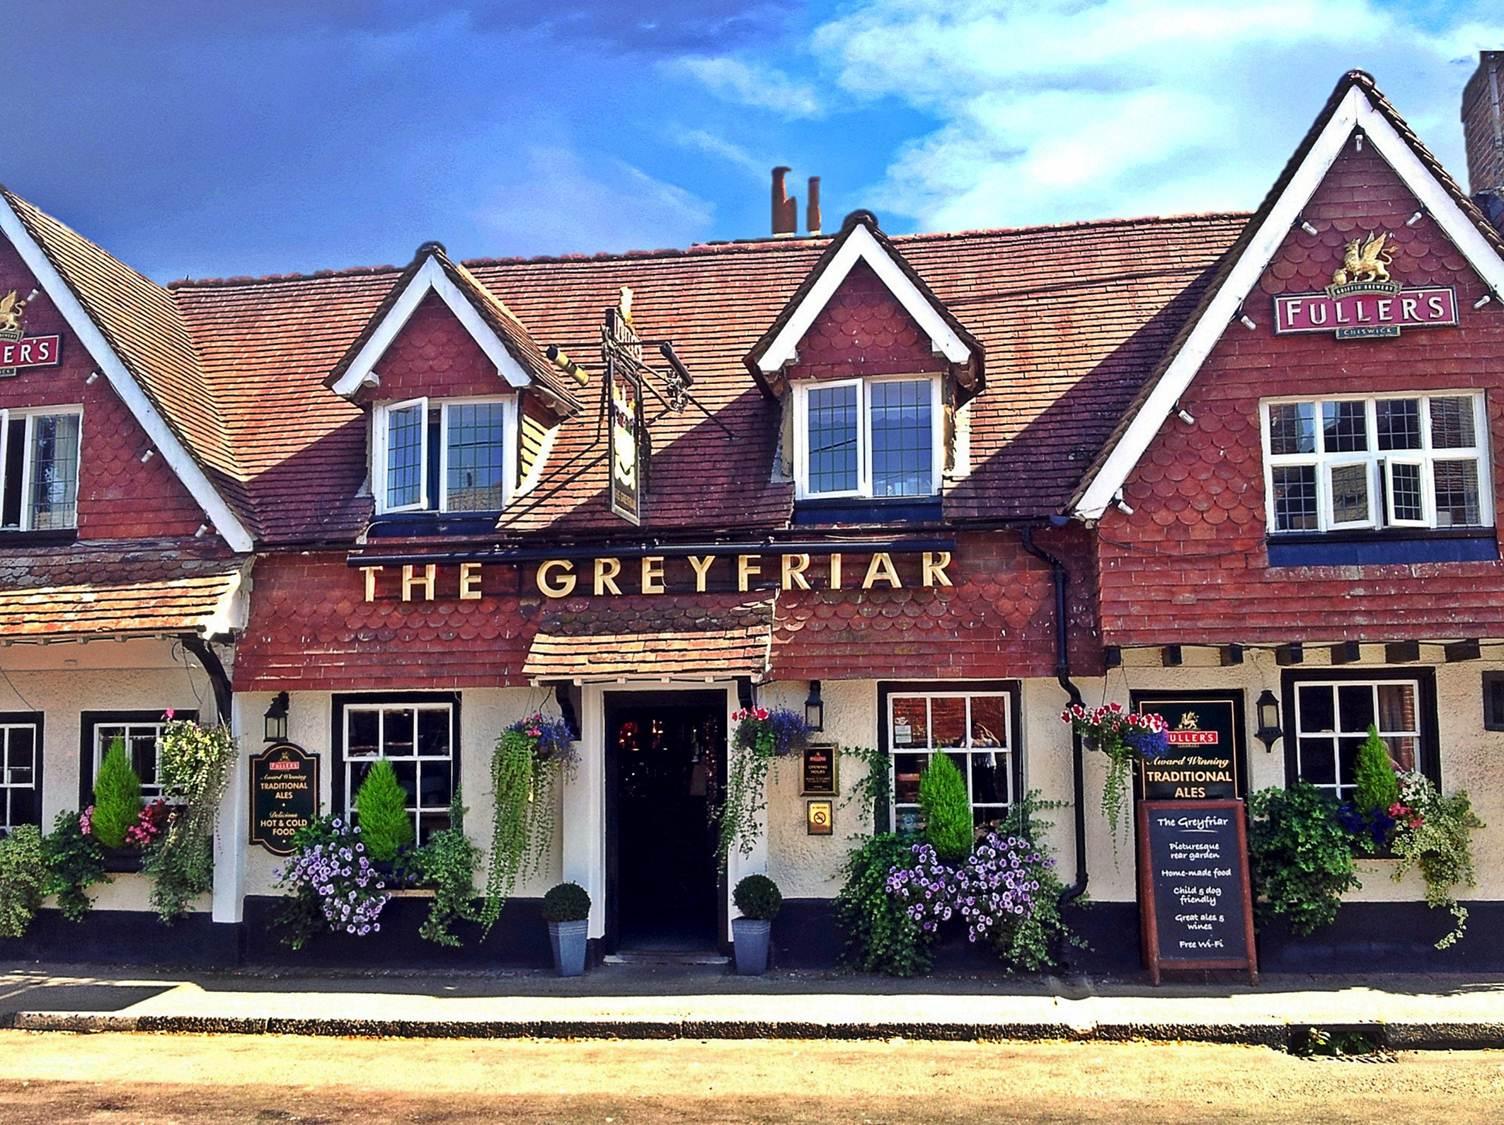 The sixteenth century Greyfriar Pub, in the village of Chawton